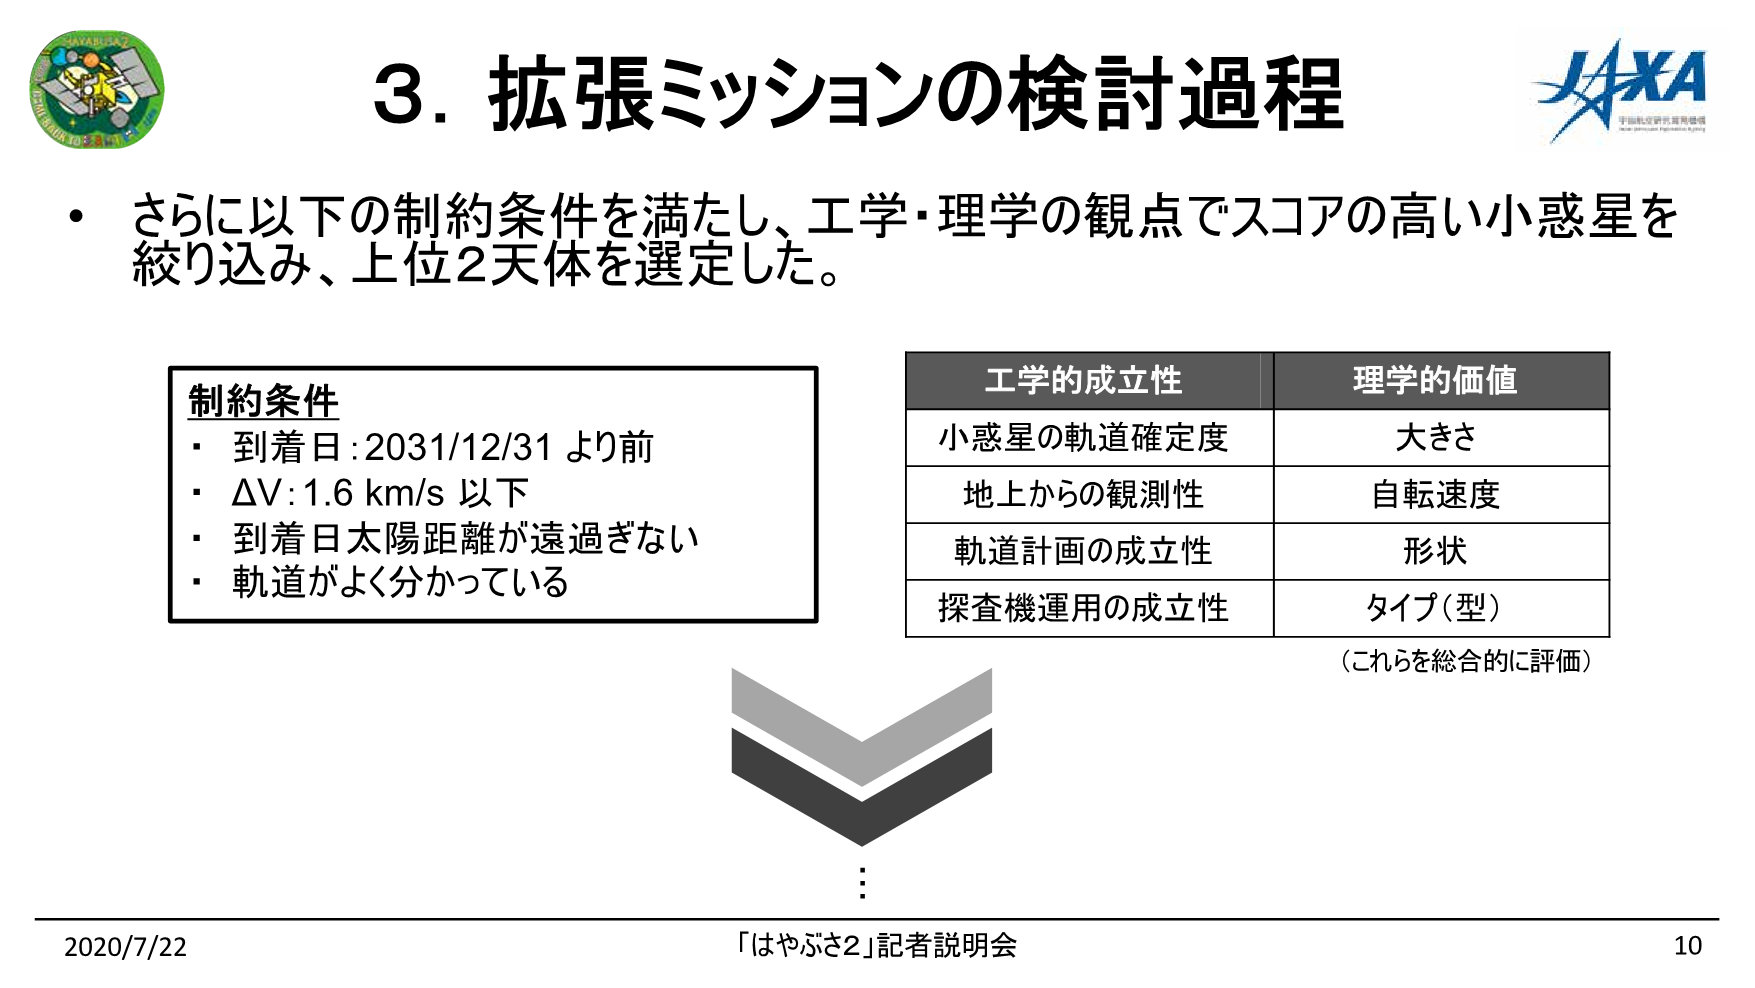 f:id:Imamura:20200722140708p:plain